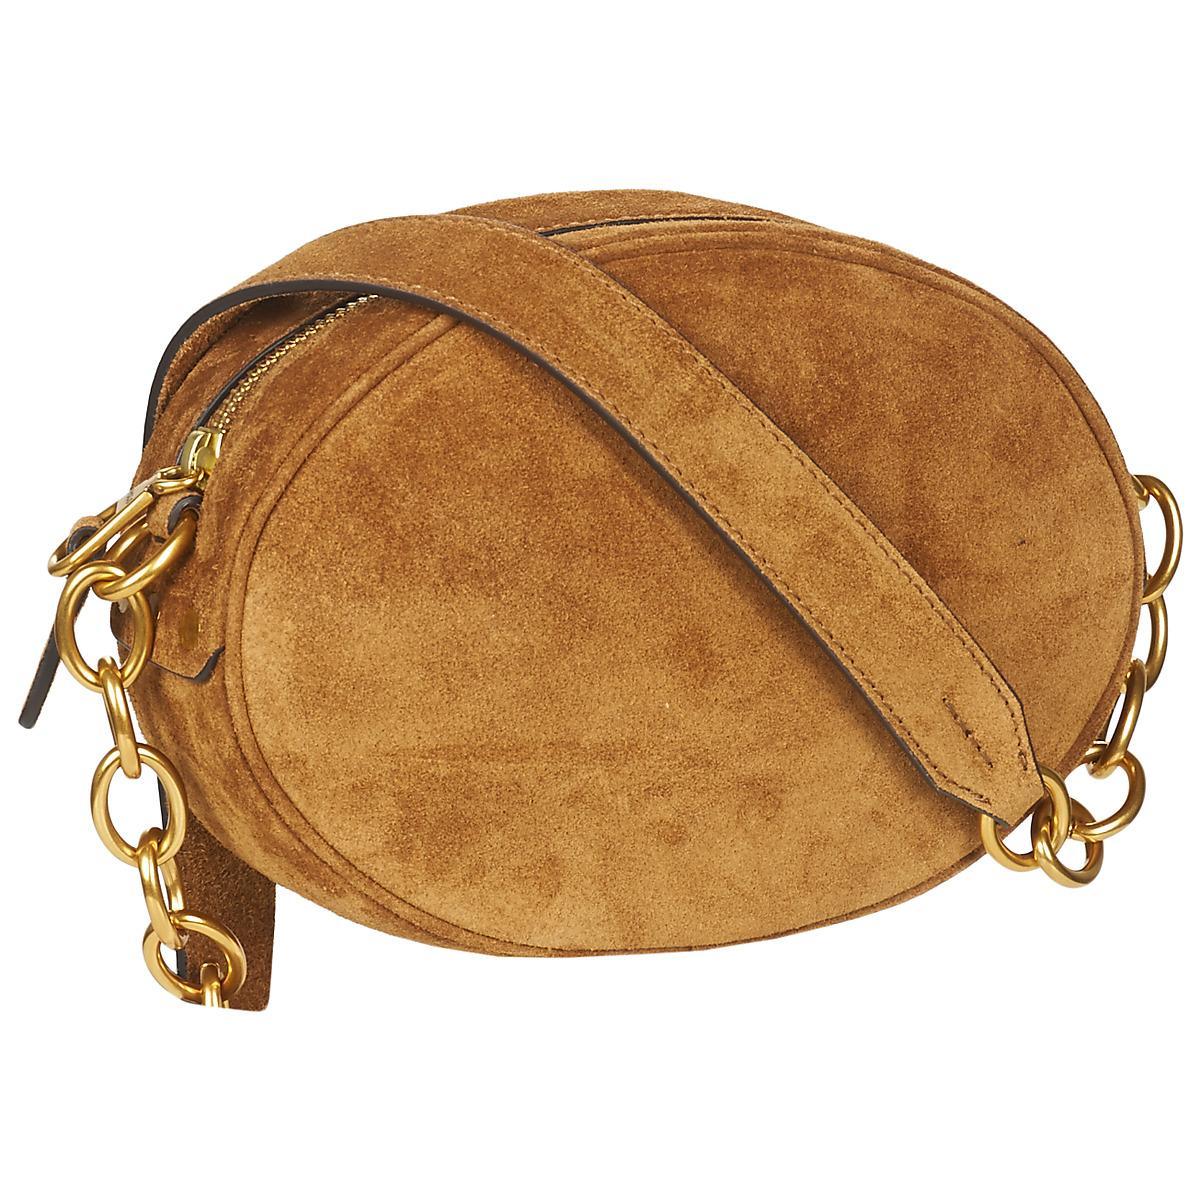 44fb48ddd9 Polo Ralph Lauren - Gilly Women s Shoulder Bag In Brown for Men - Lyst.  View fullscreen